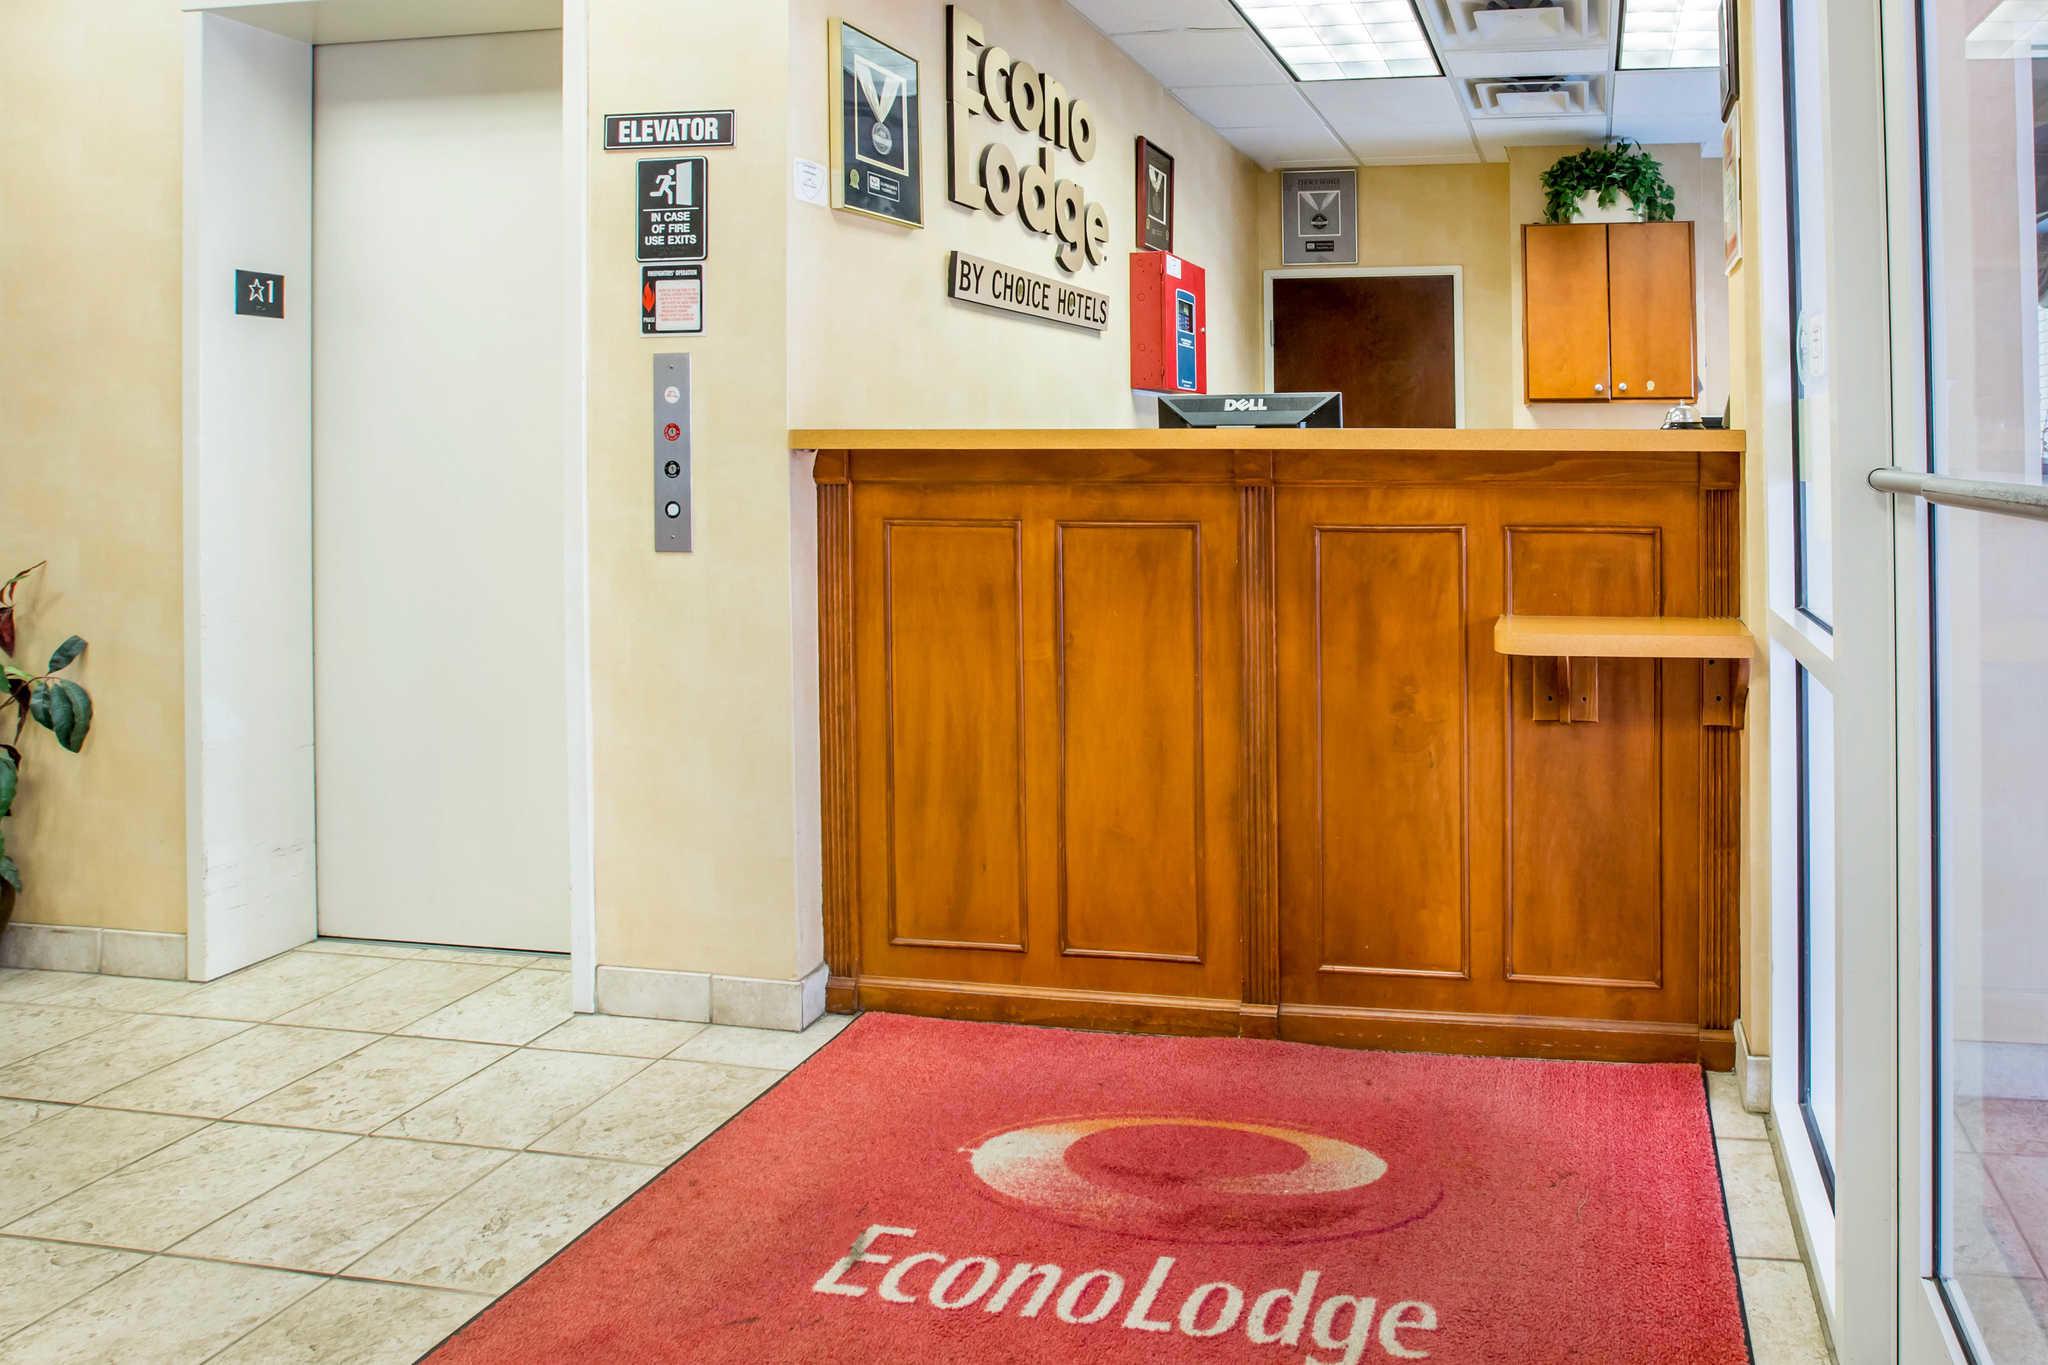 Econo Lodge image 4